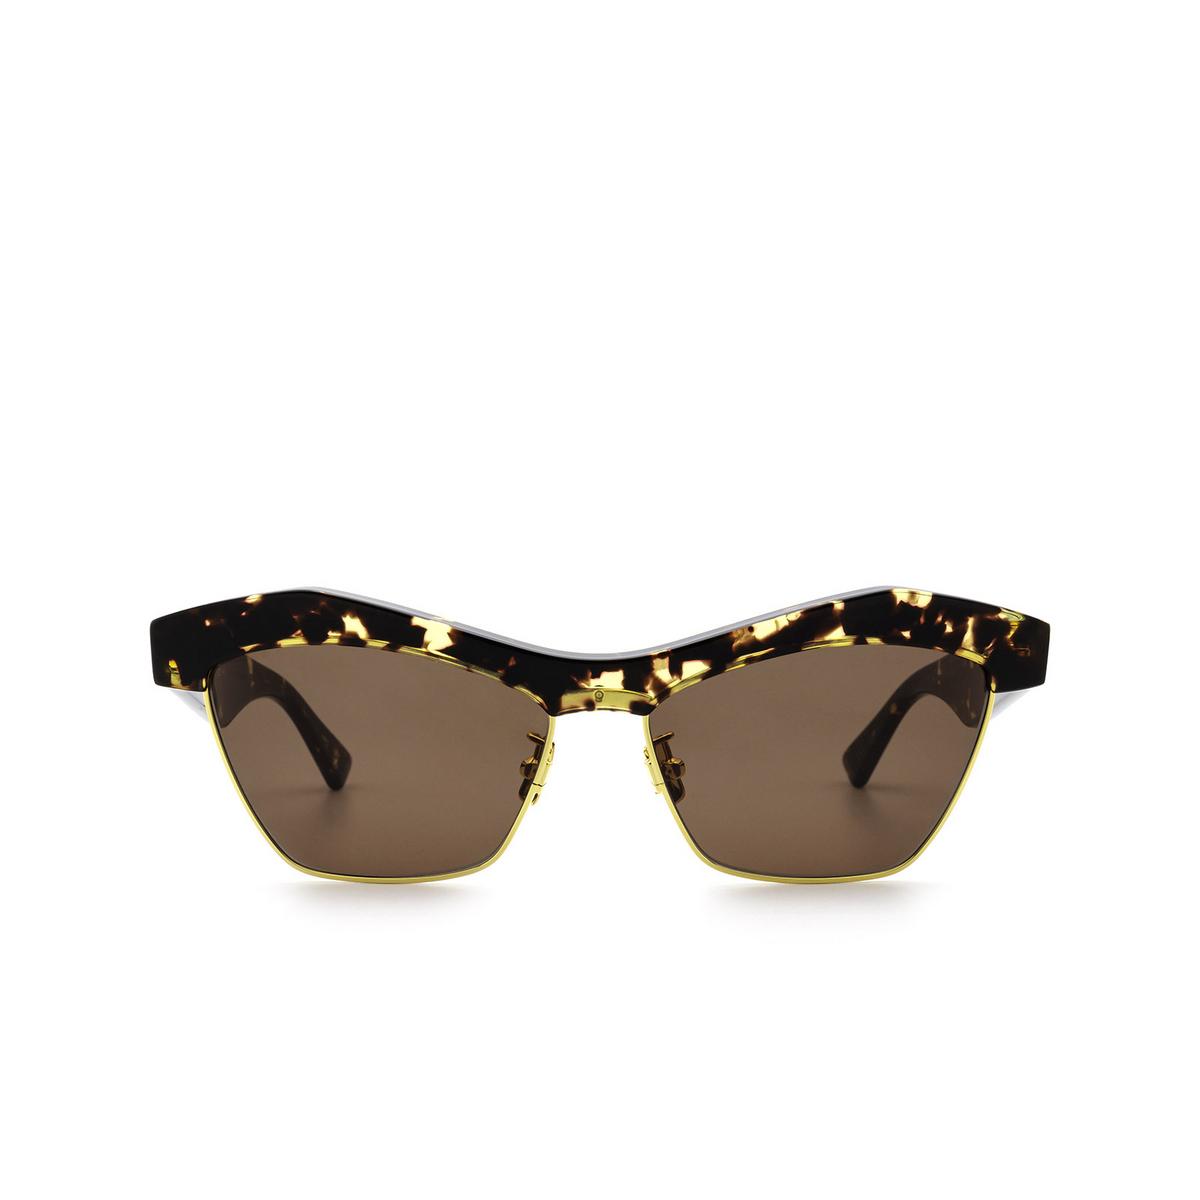 Bottega Veneta® Irregular Sunglasses: BV1099S color Havana 002 - front view.